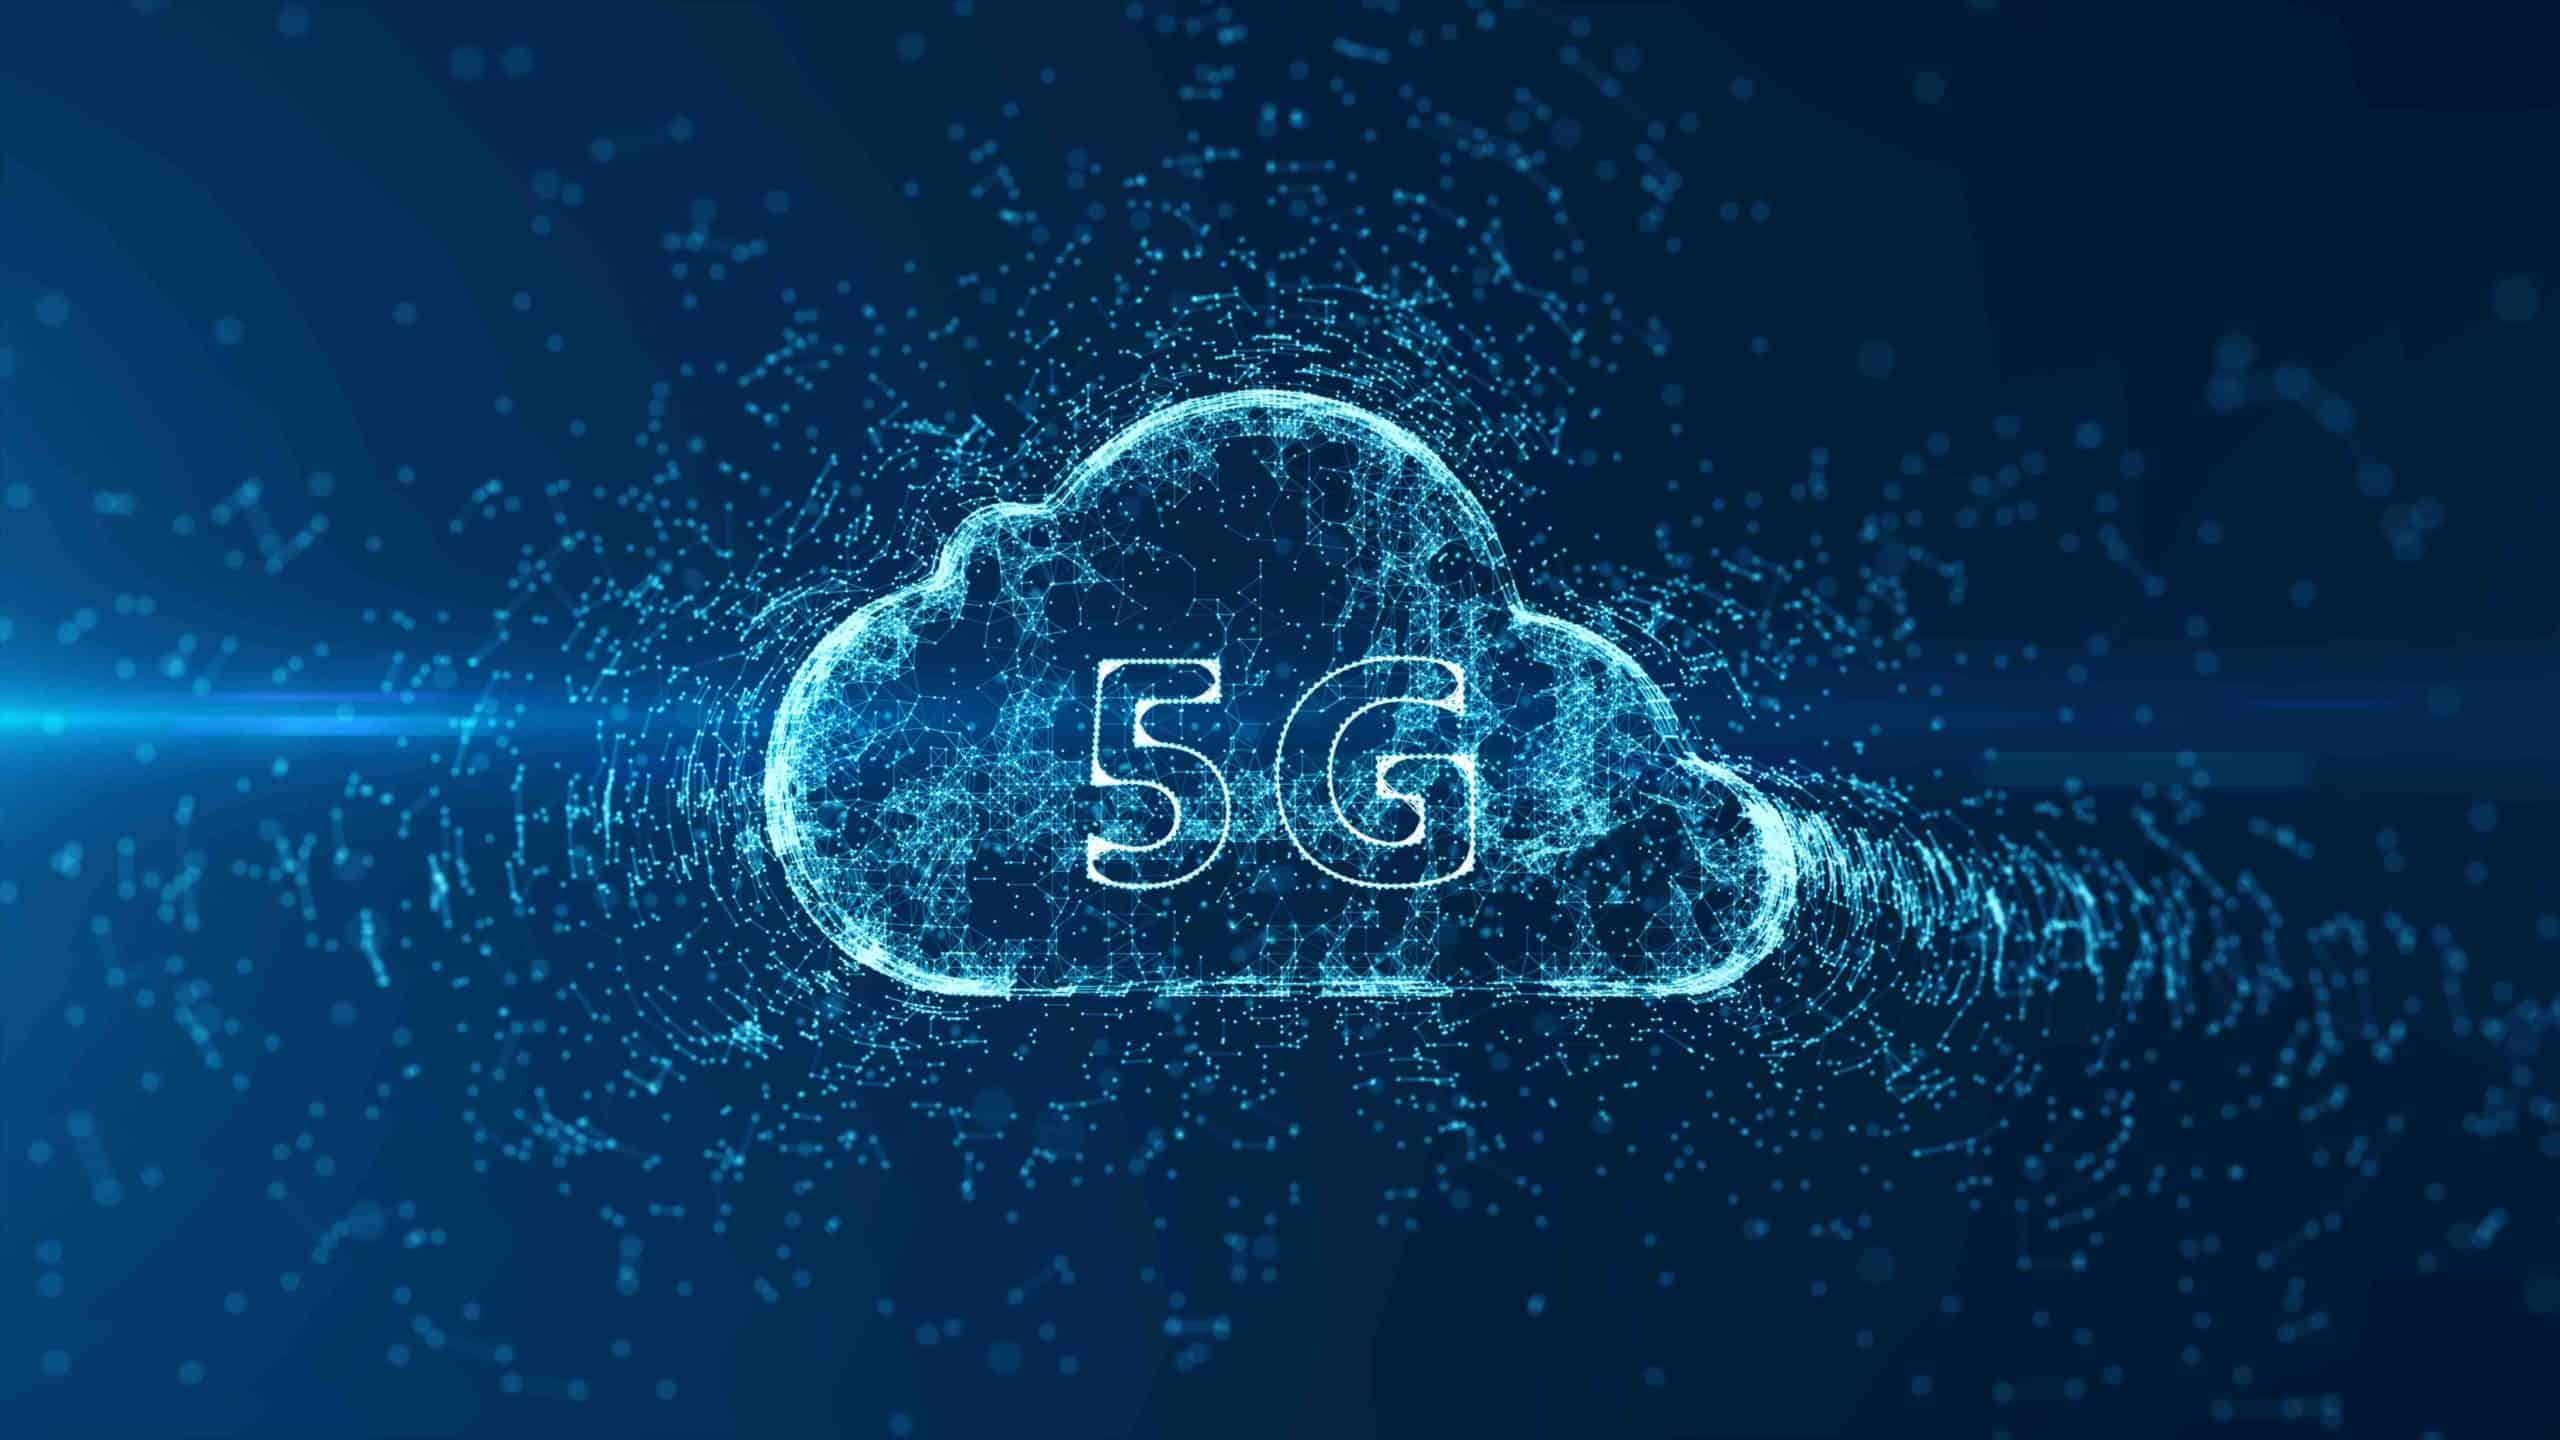 5G and Cloud computing